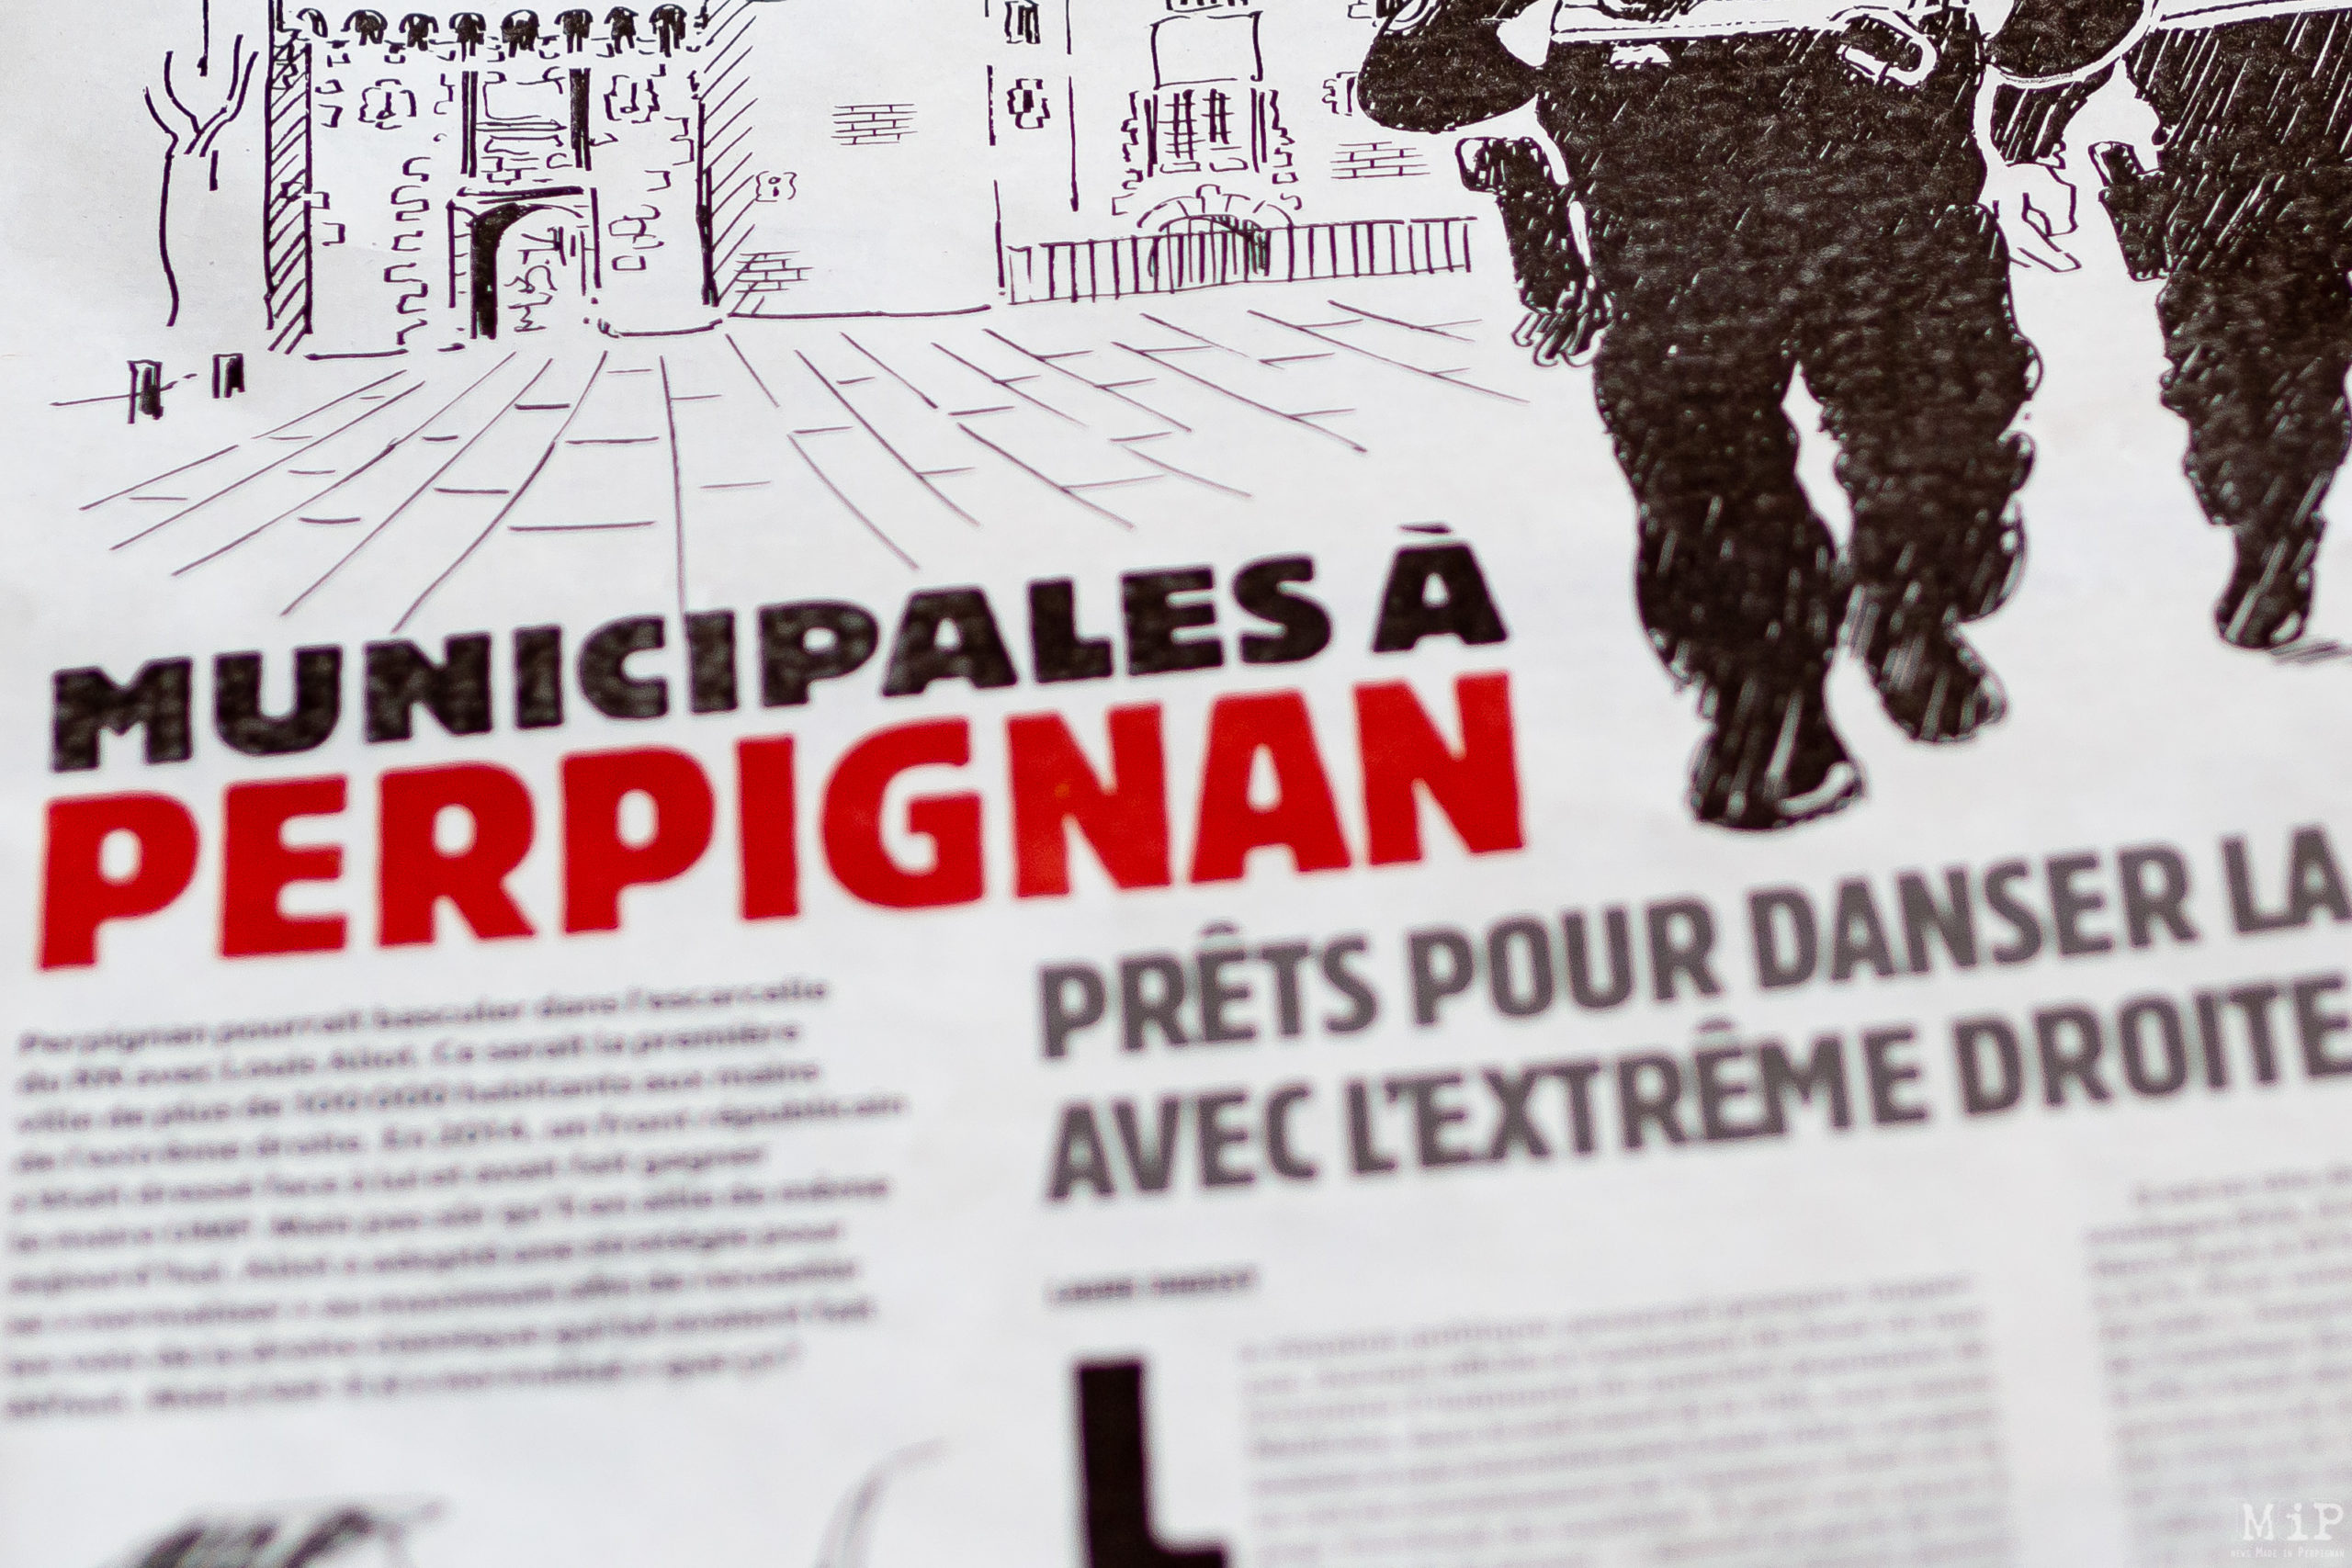 Charlie Hebdo 11 Mars 2020 - Municipales à Perpignan